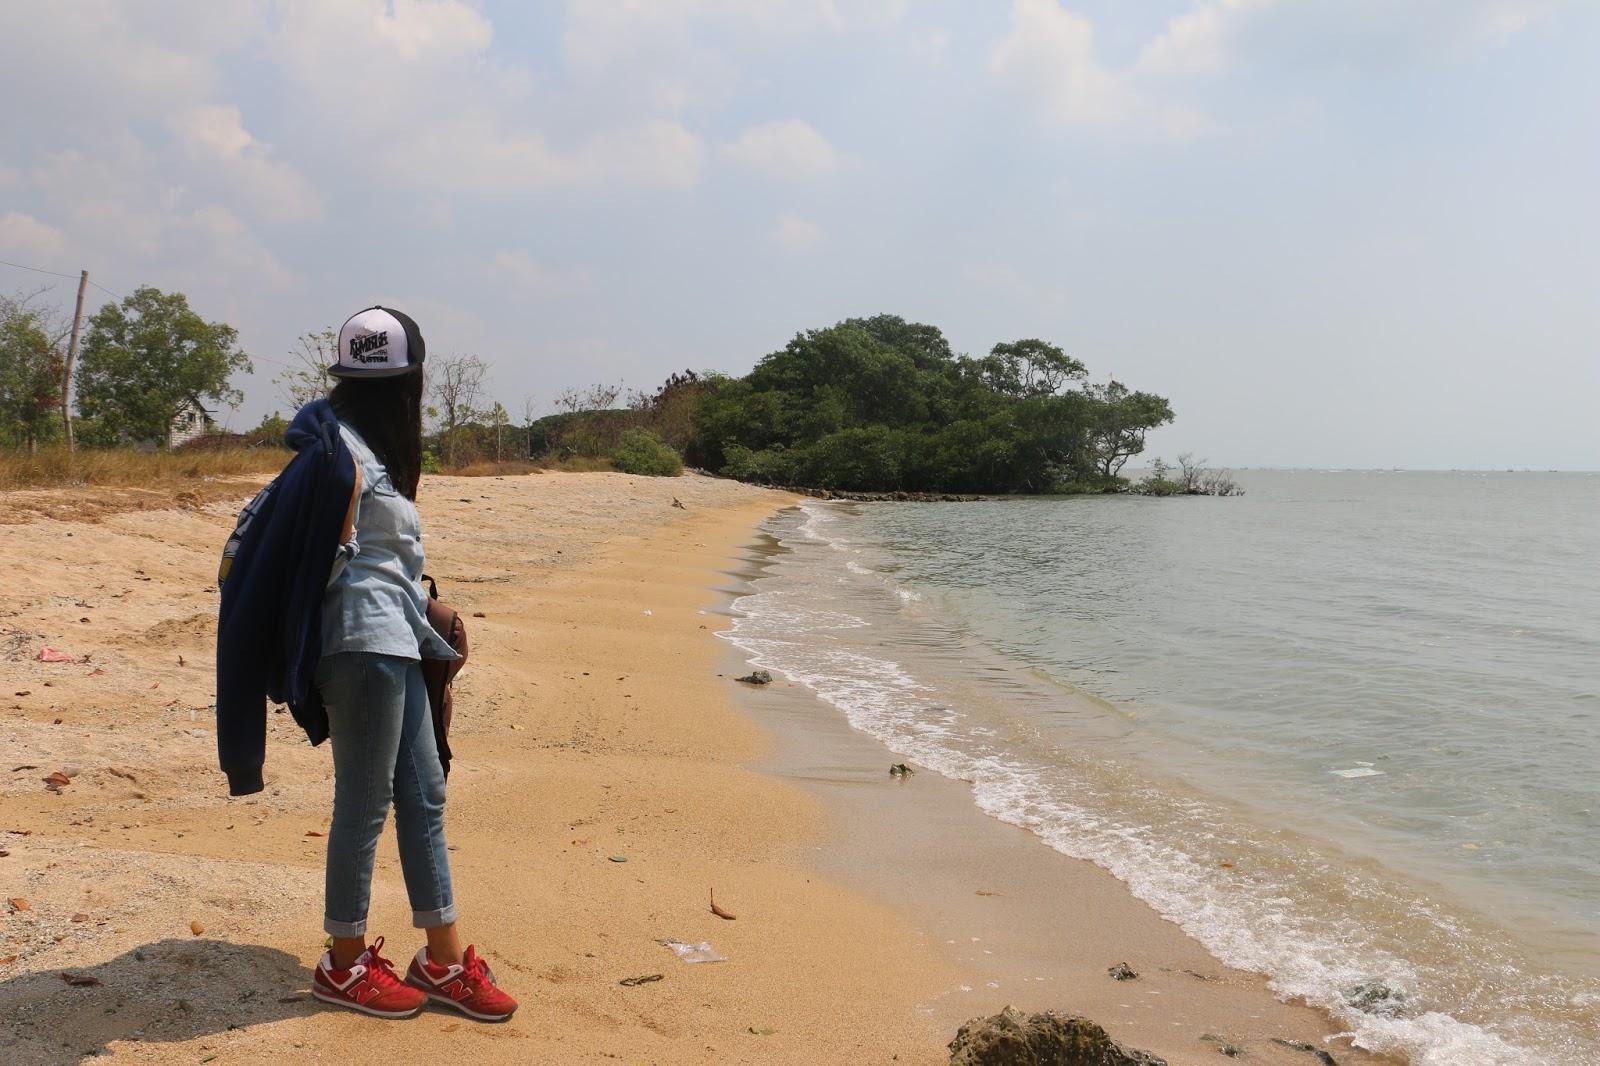 Destinasi Wisata Lamongan Berita Pantai Brondong Makam Dewi Serdadu Kab